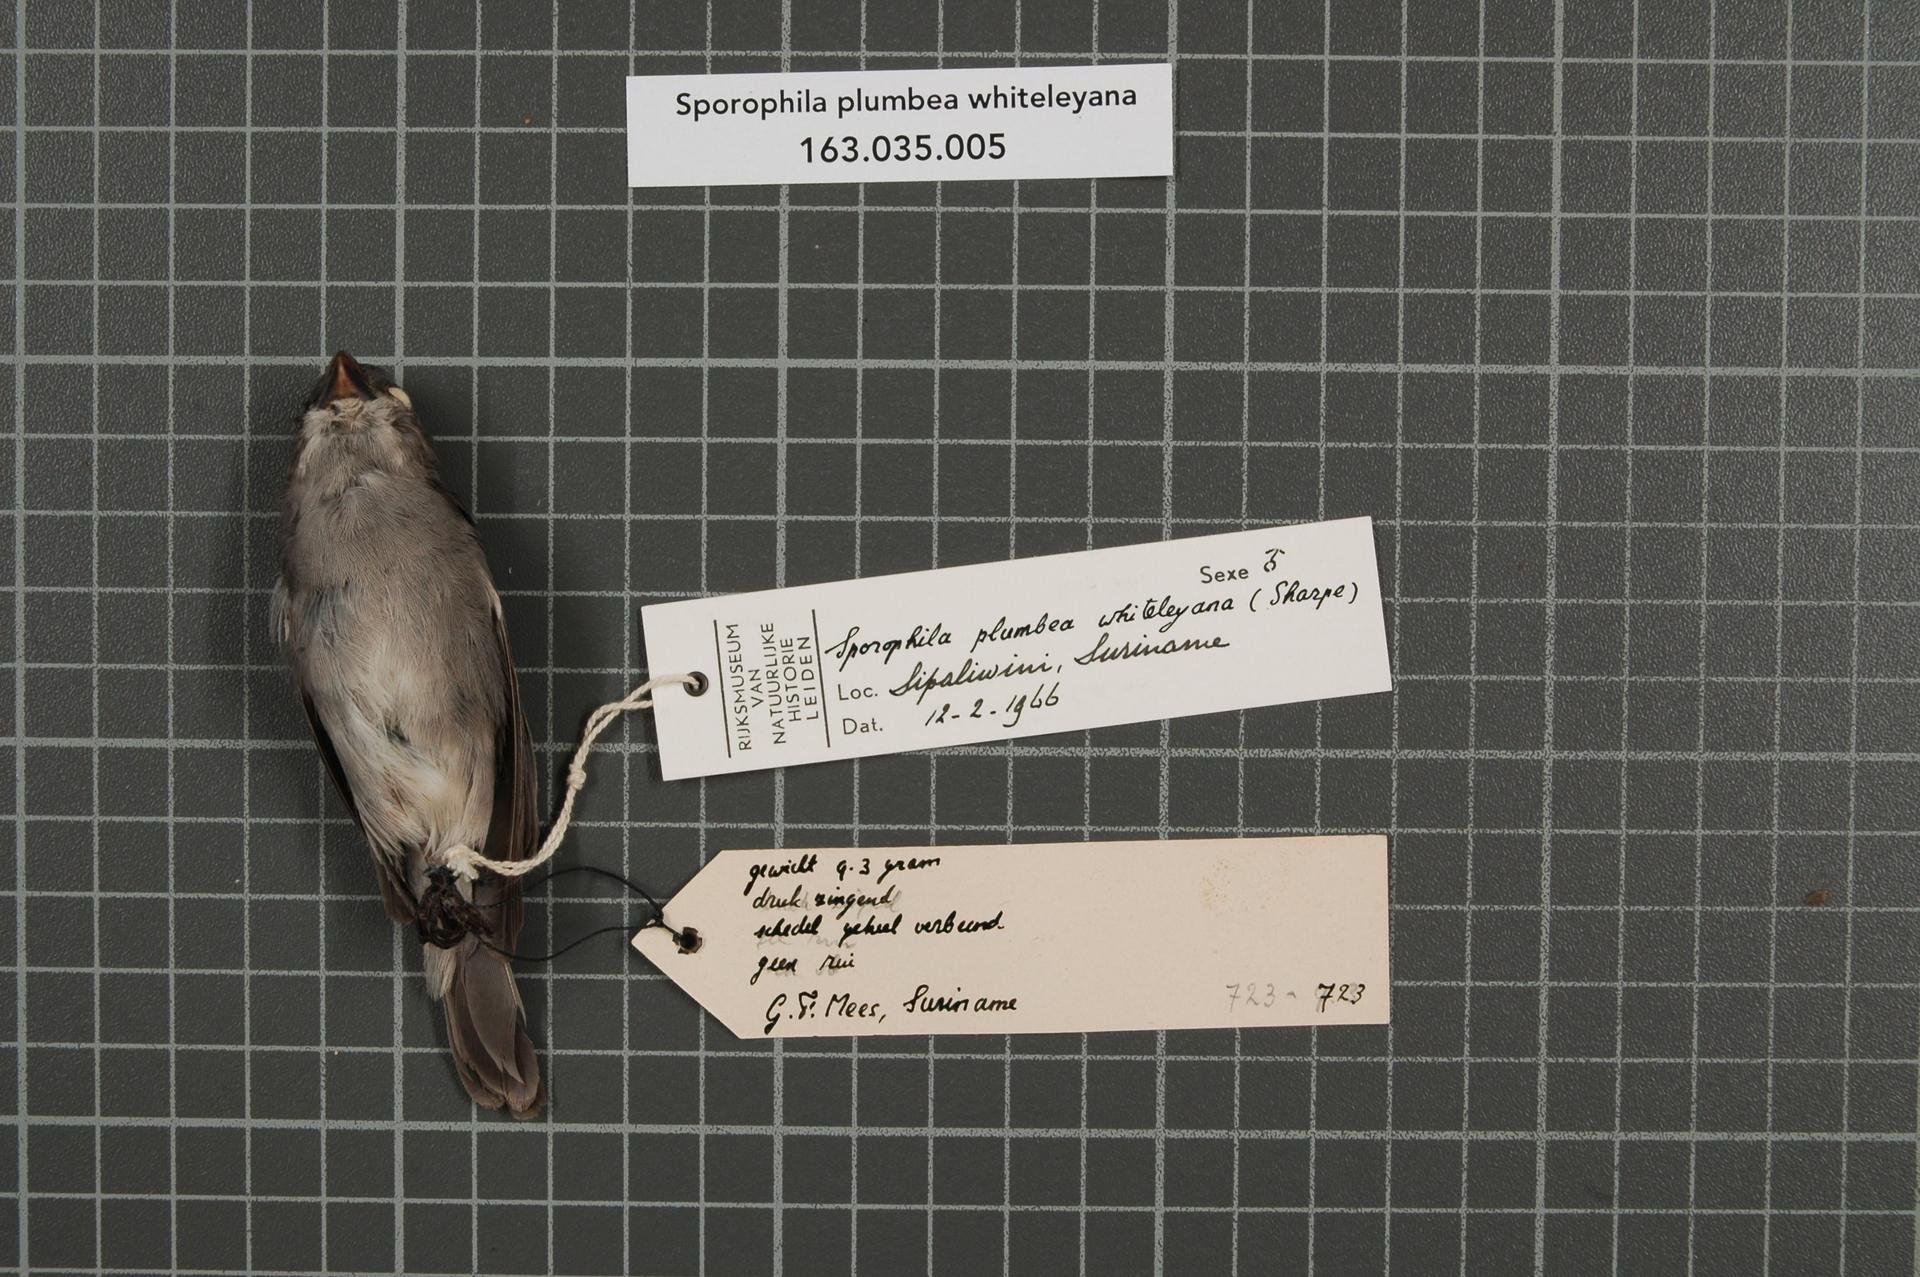 RMNH.AVES.39248   Sporophila plumbea whiteleyana (Sharpe, 1888)